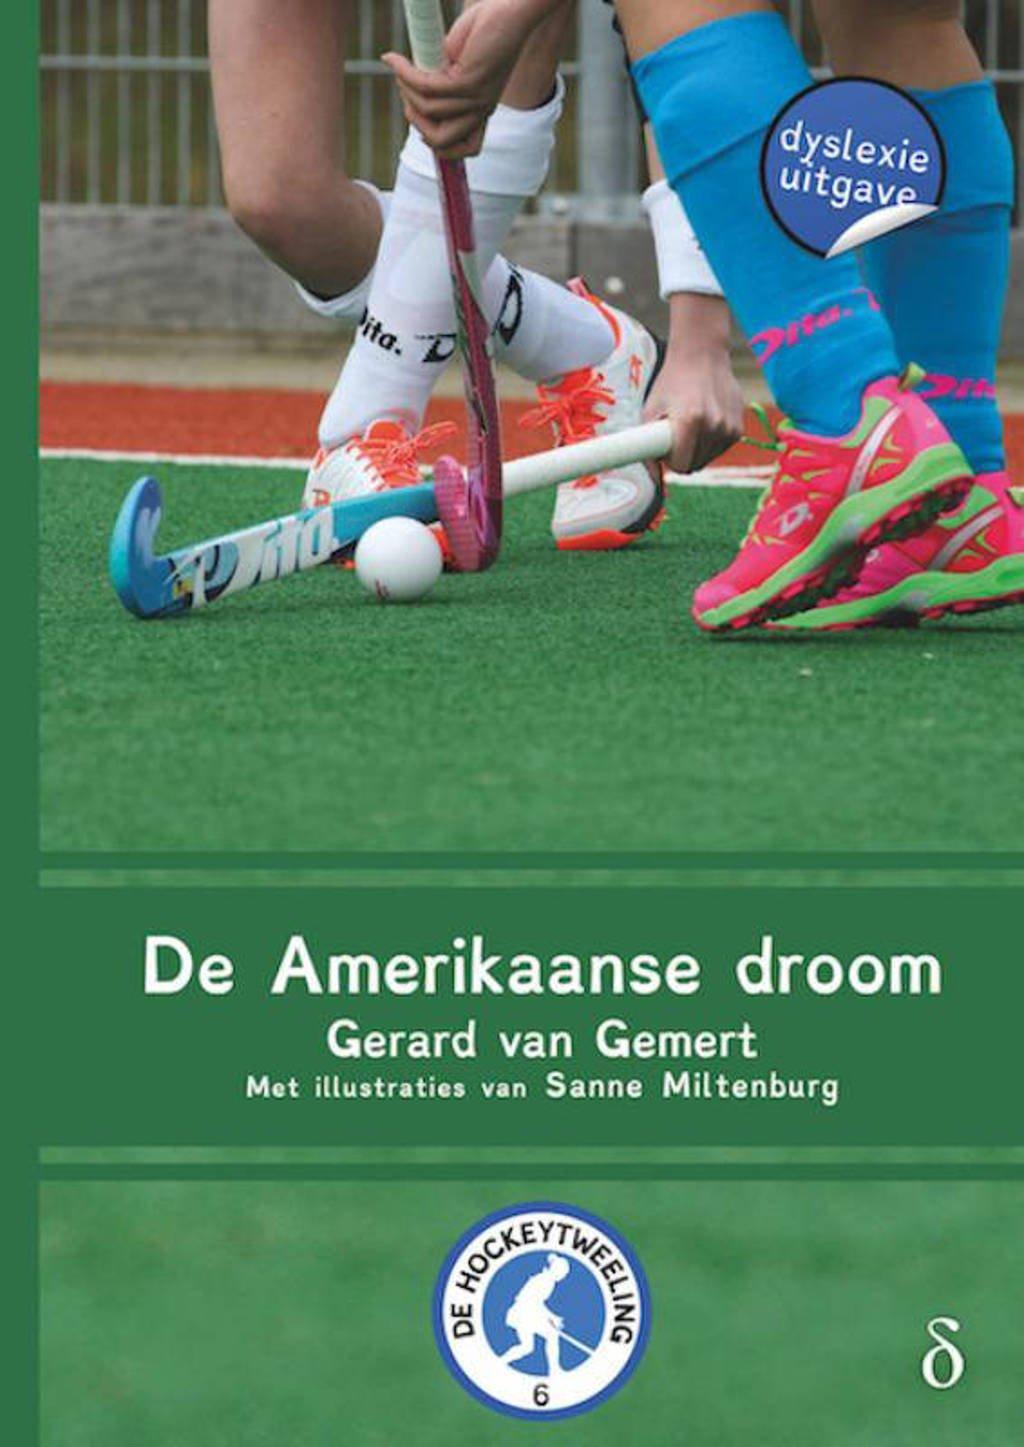 De Hockeytweeling: De Amerikaanse droom - Gerard van Gemert